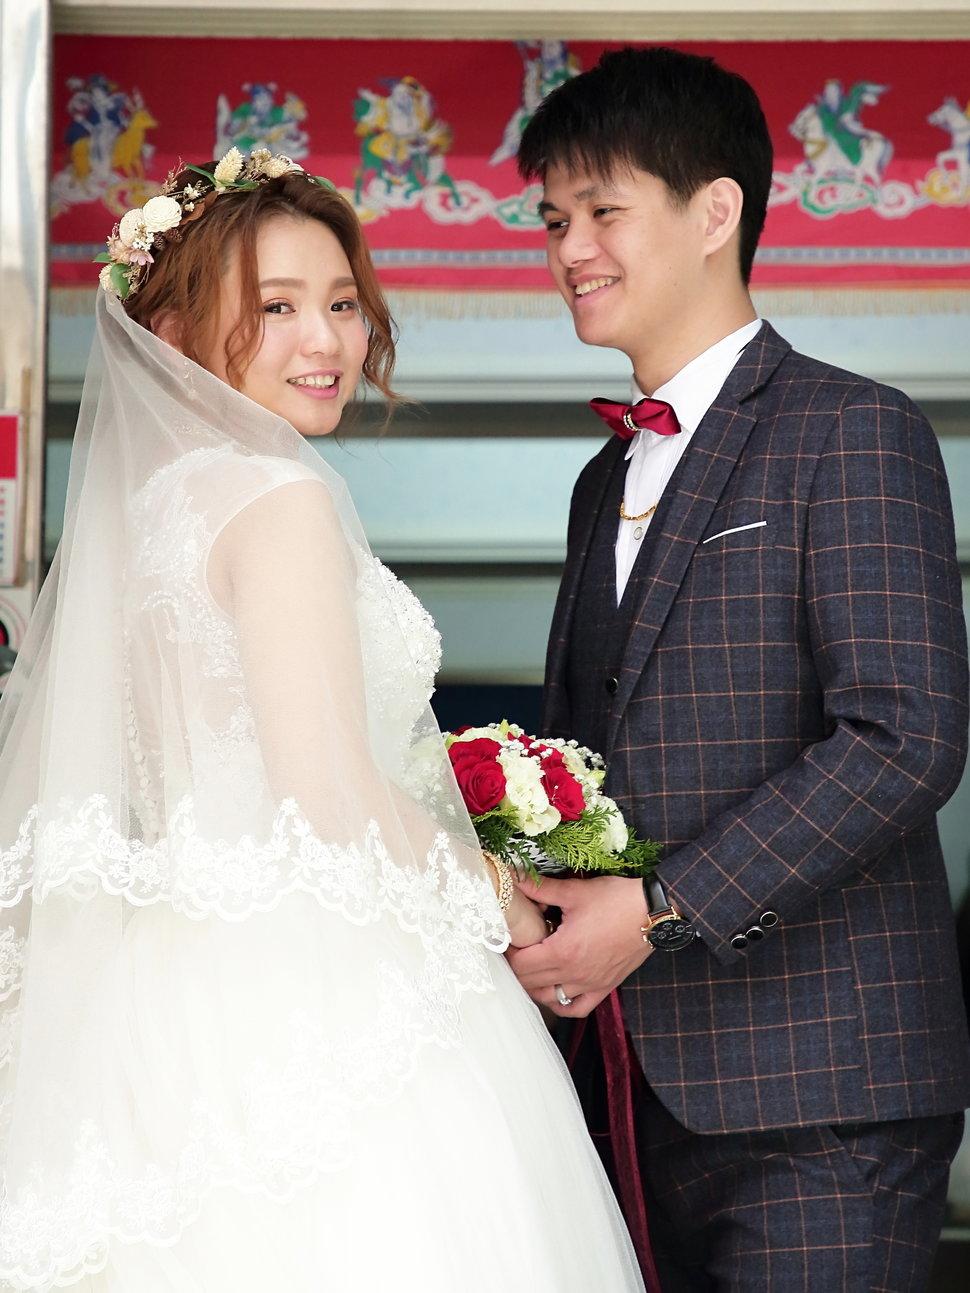 201902230234 - Loveliness ♥ wedding - 結婚吧